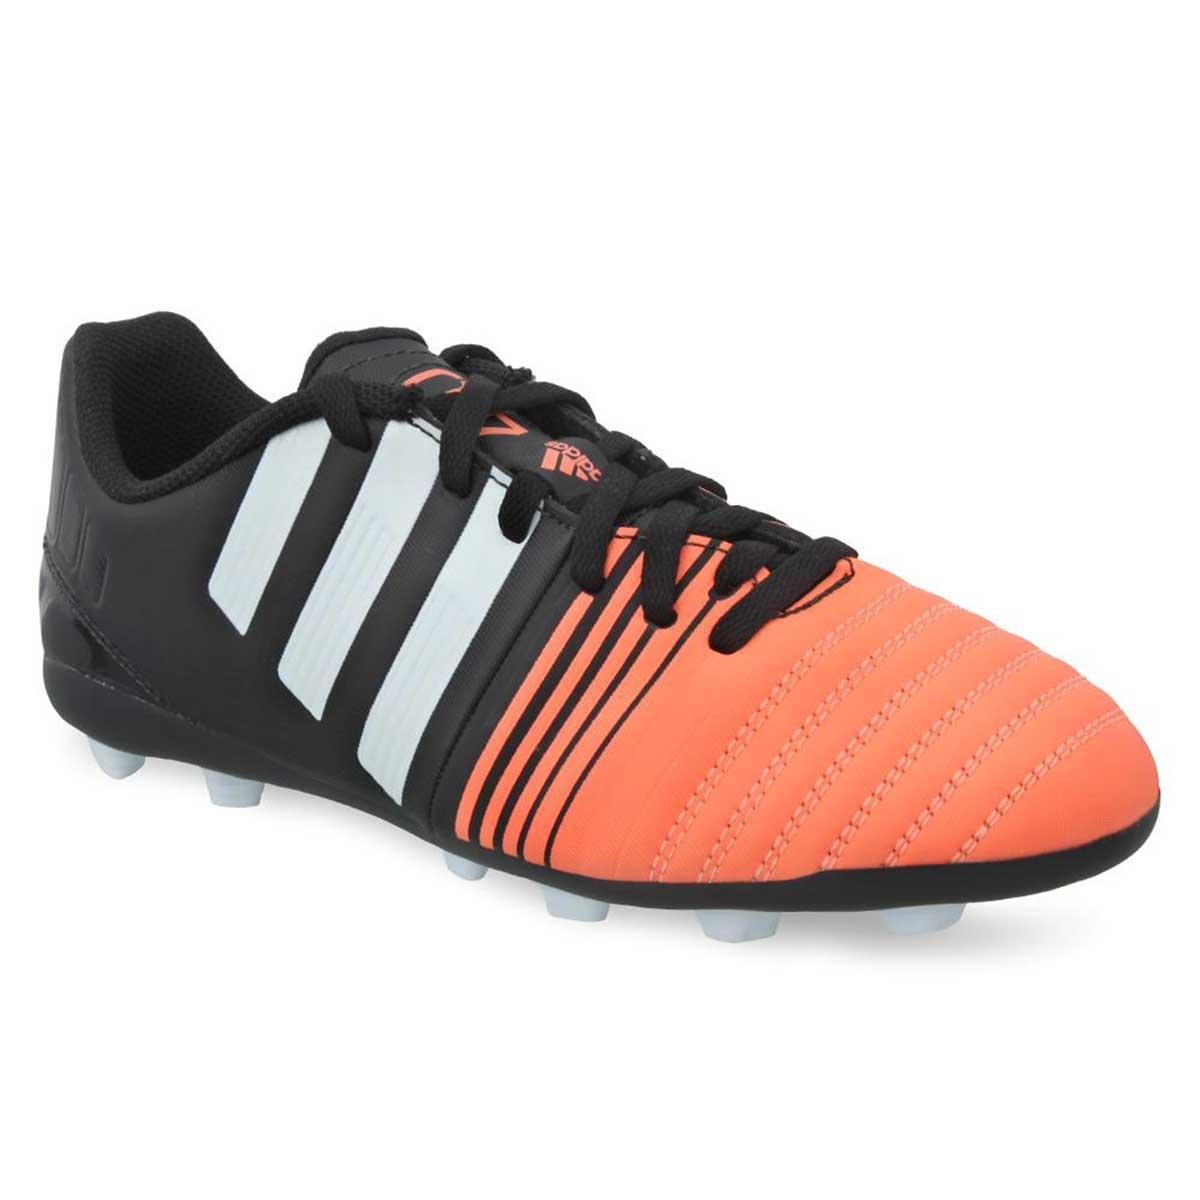 voetbalschoenen 0 Fxg Koop Nitrocharge zwart Junior 4 online Adidas FxFYwq1